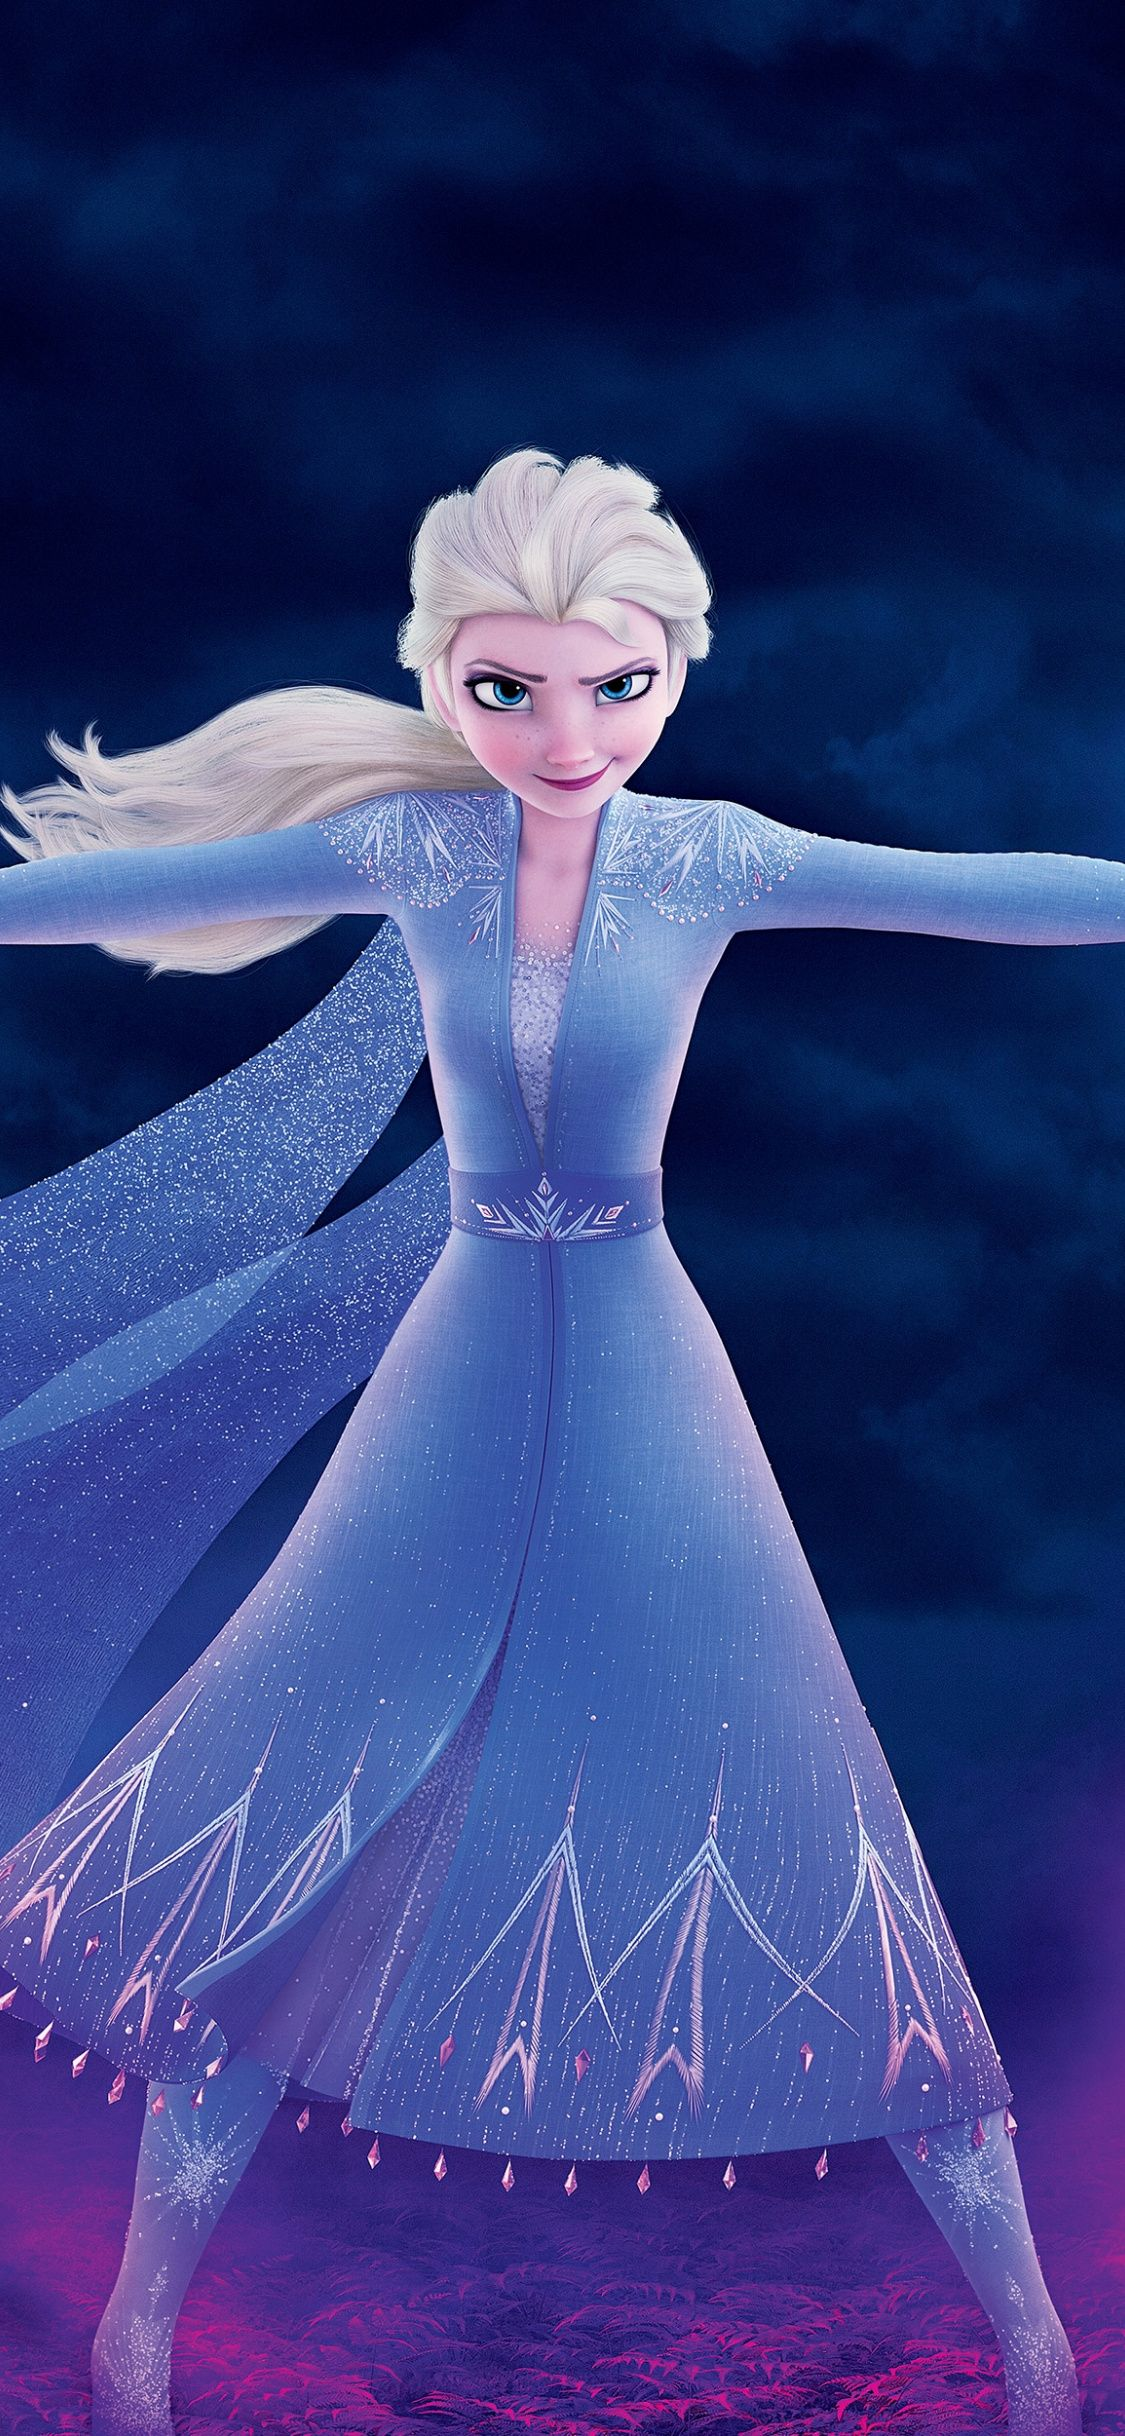 Snow Fire Eelsa From Frozen 2 Movie Wallpaper Hd Image Picture C6aad110 In 2020 Disney Princess Frozen Disney Princess Elsa Frozen Disney Movie